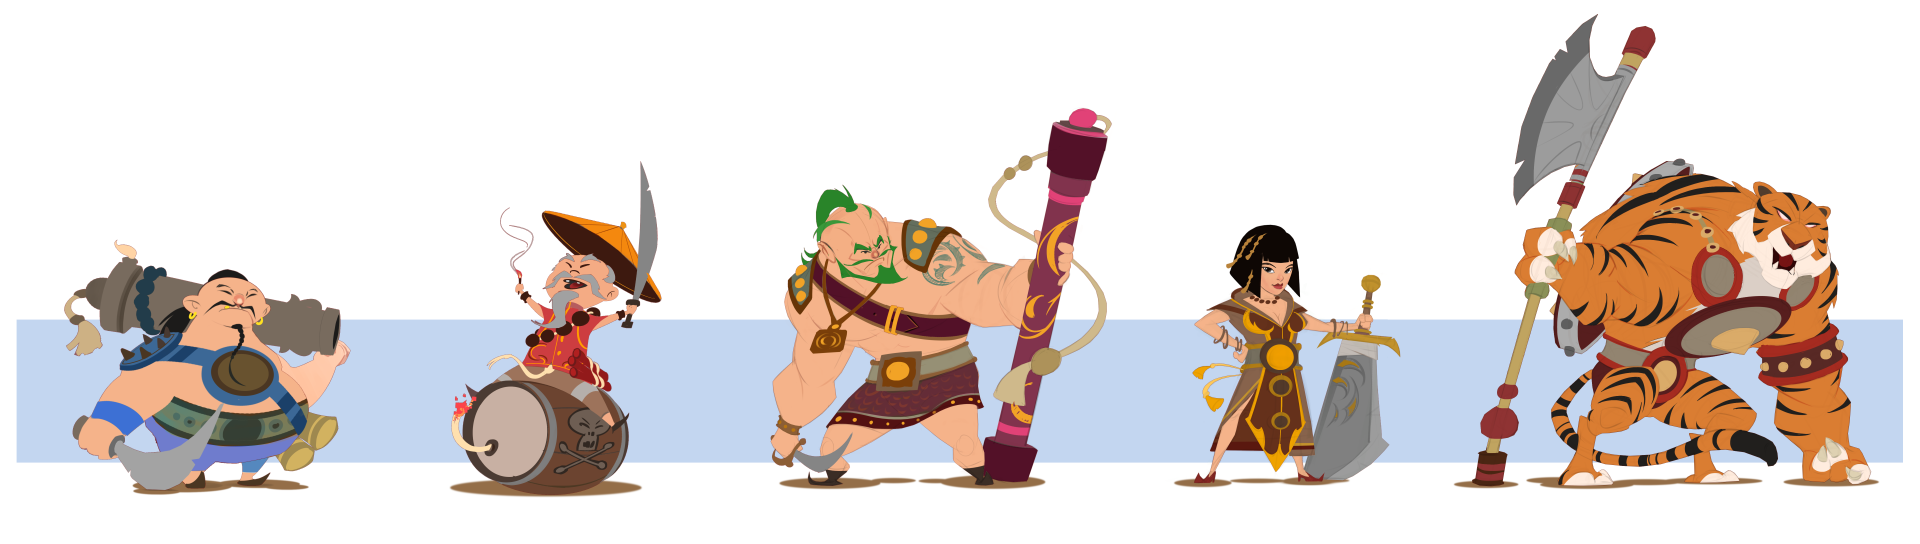 Pirates Concepts